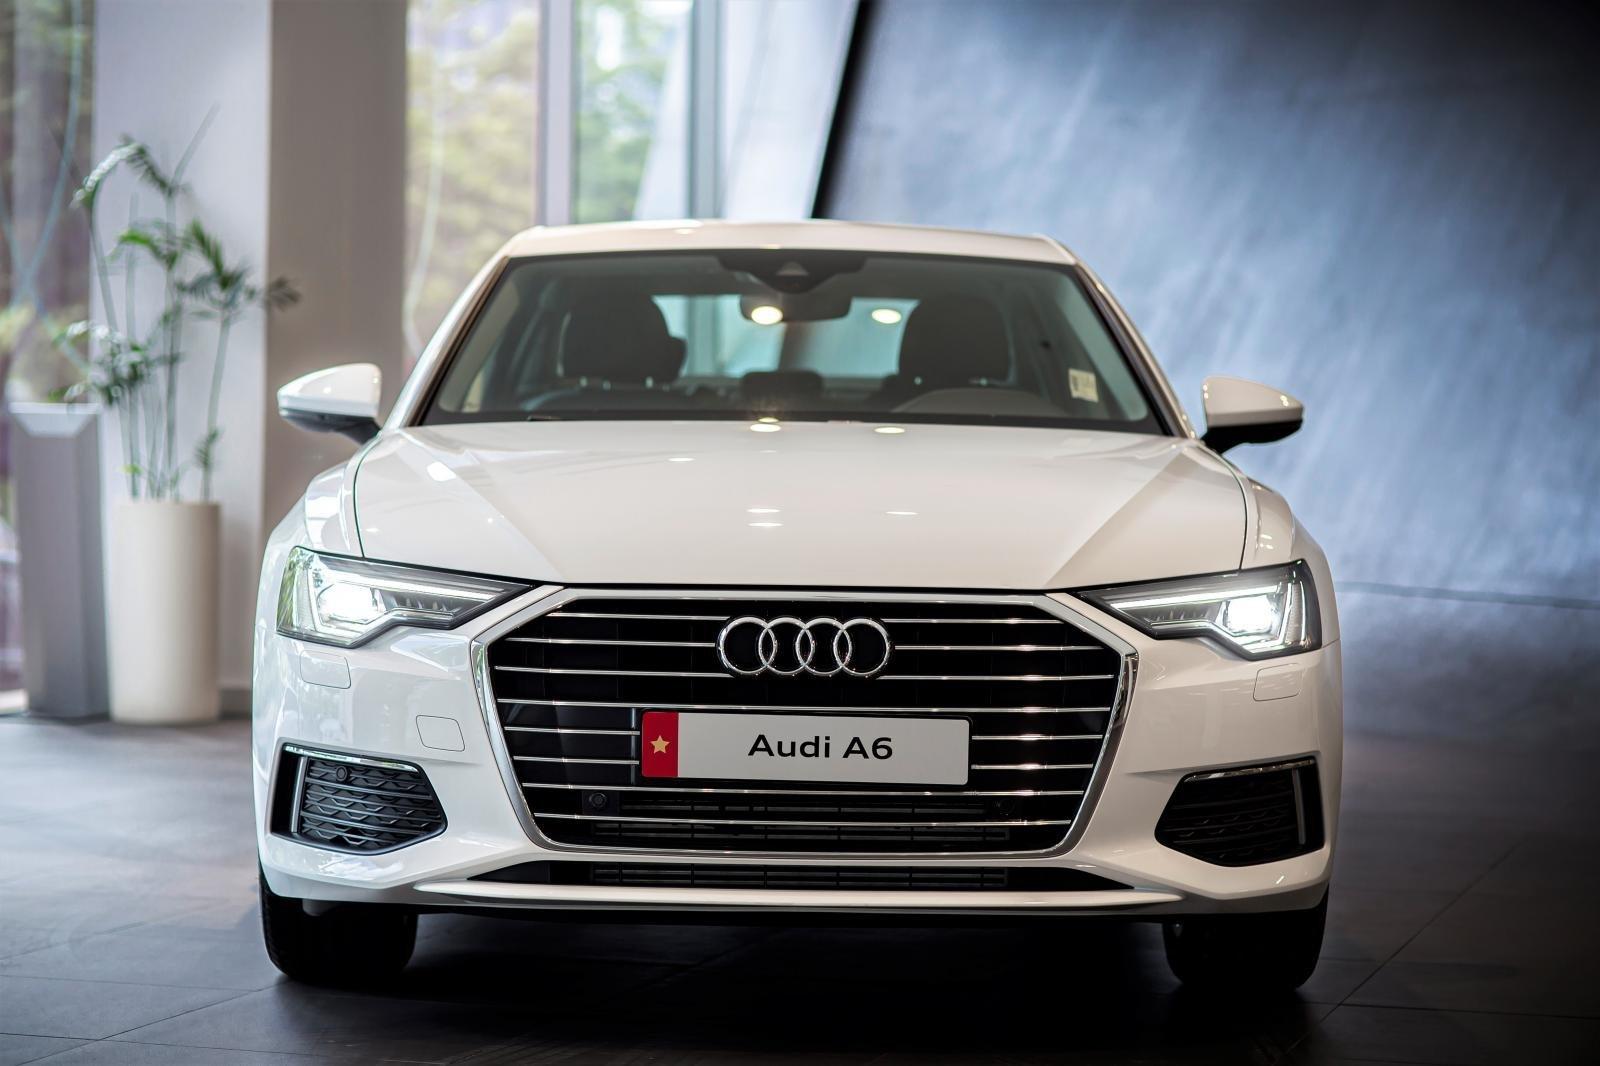 Ngoại thất xe Audi A6 2020.